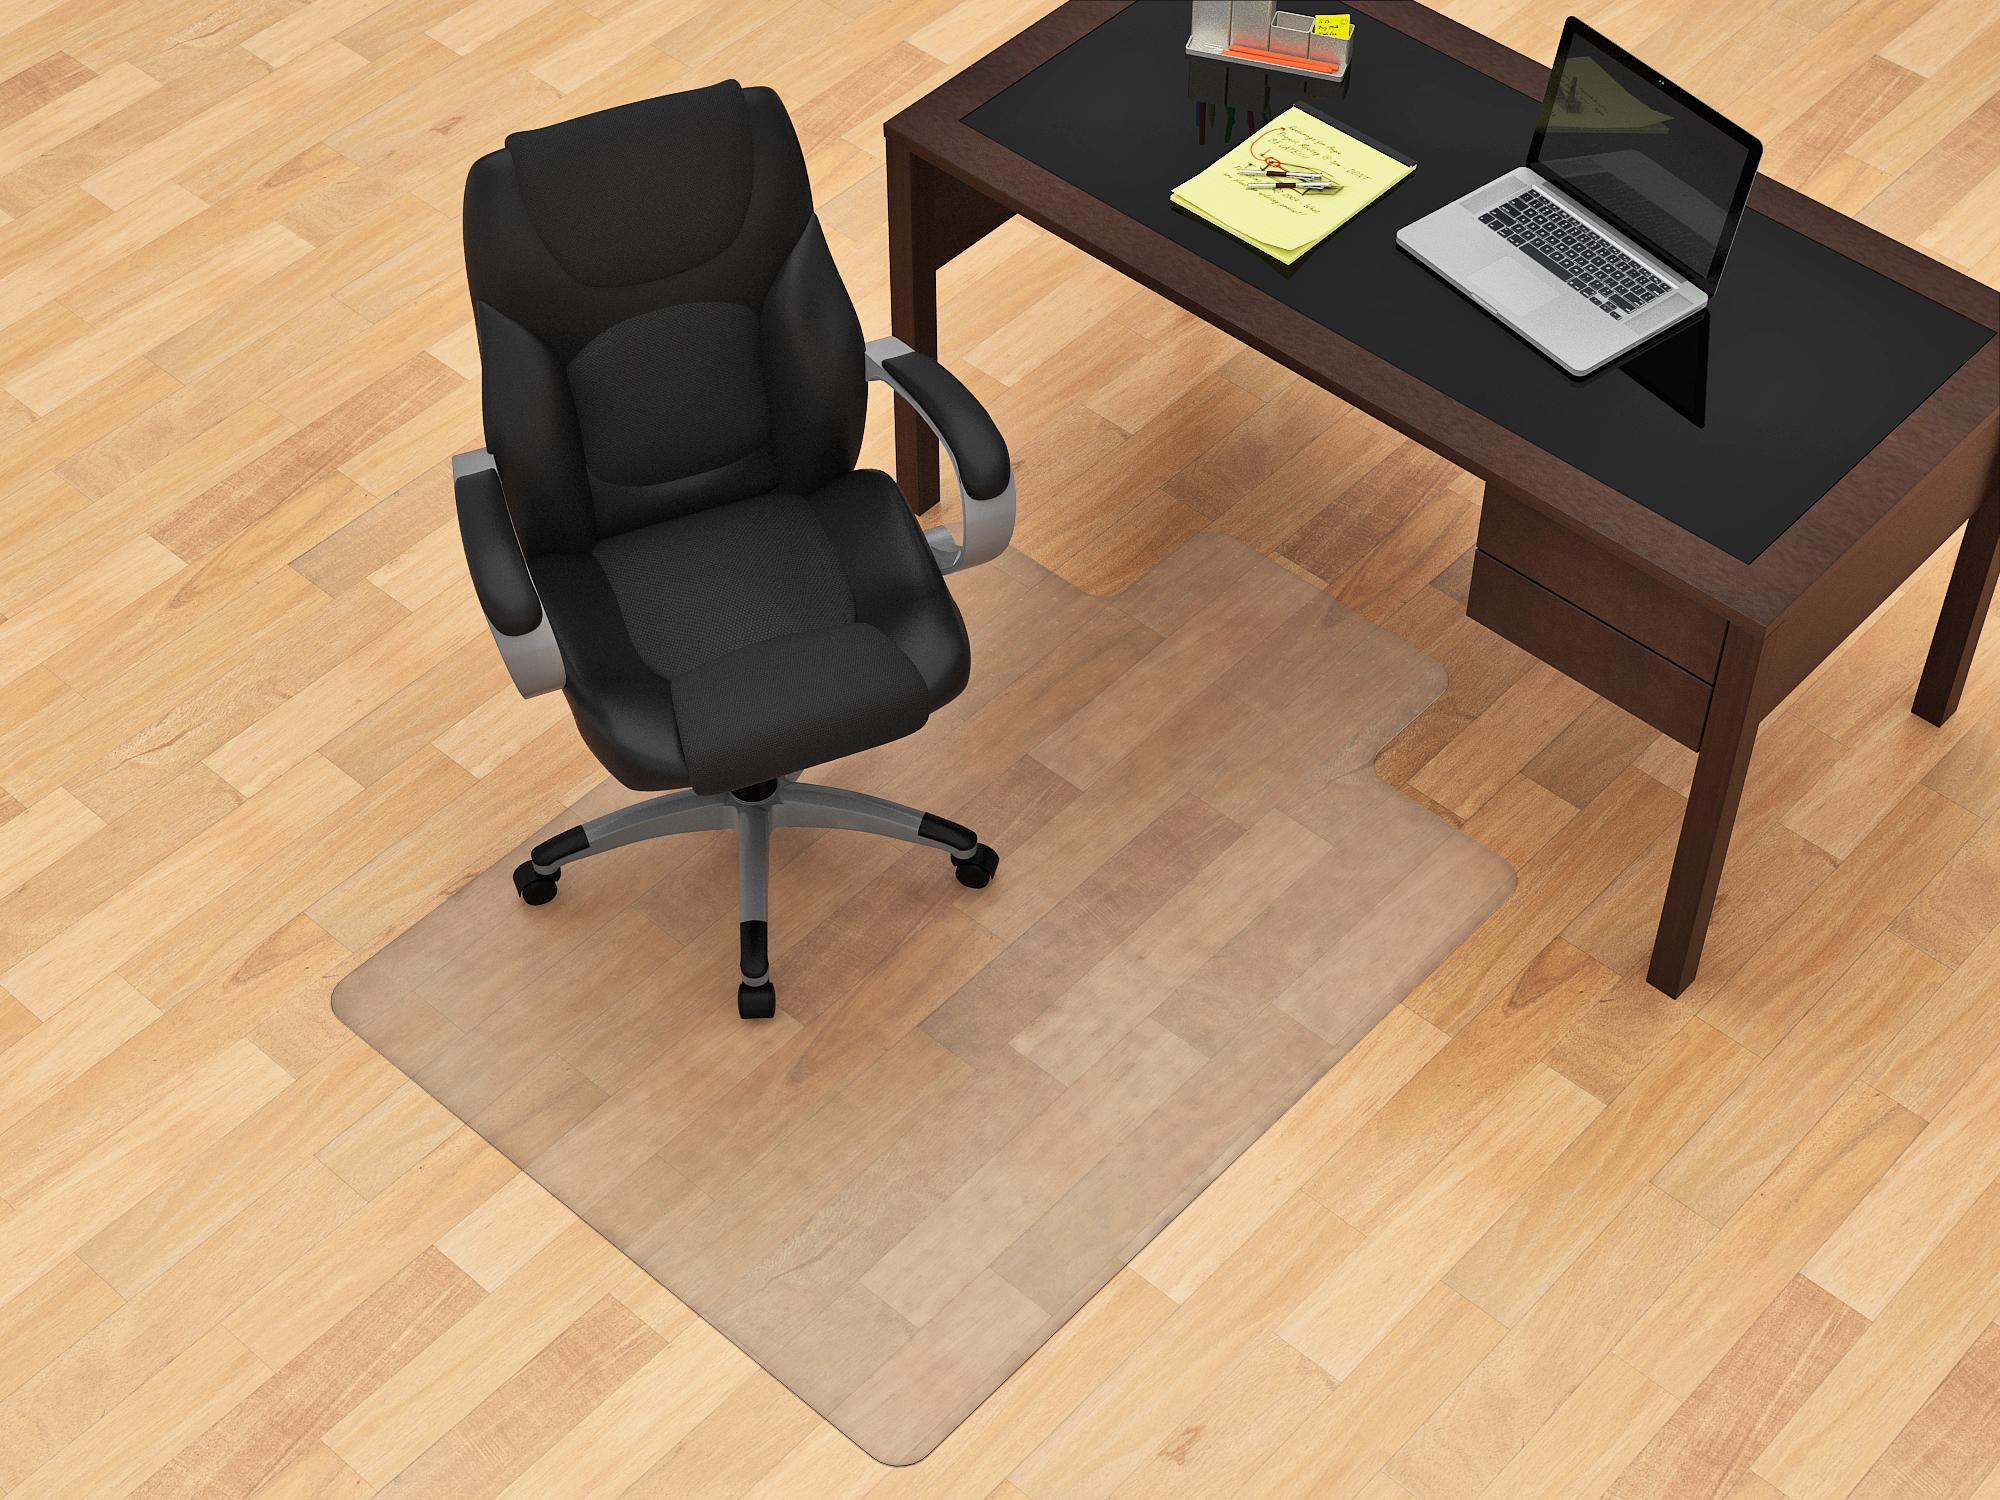 ergonomic chair mat design guild 45 x 53 hardfloor chairmat 46 30 ojcommerce